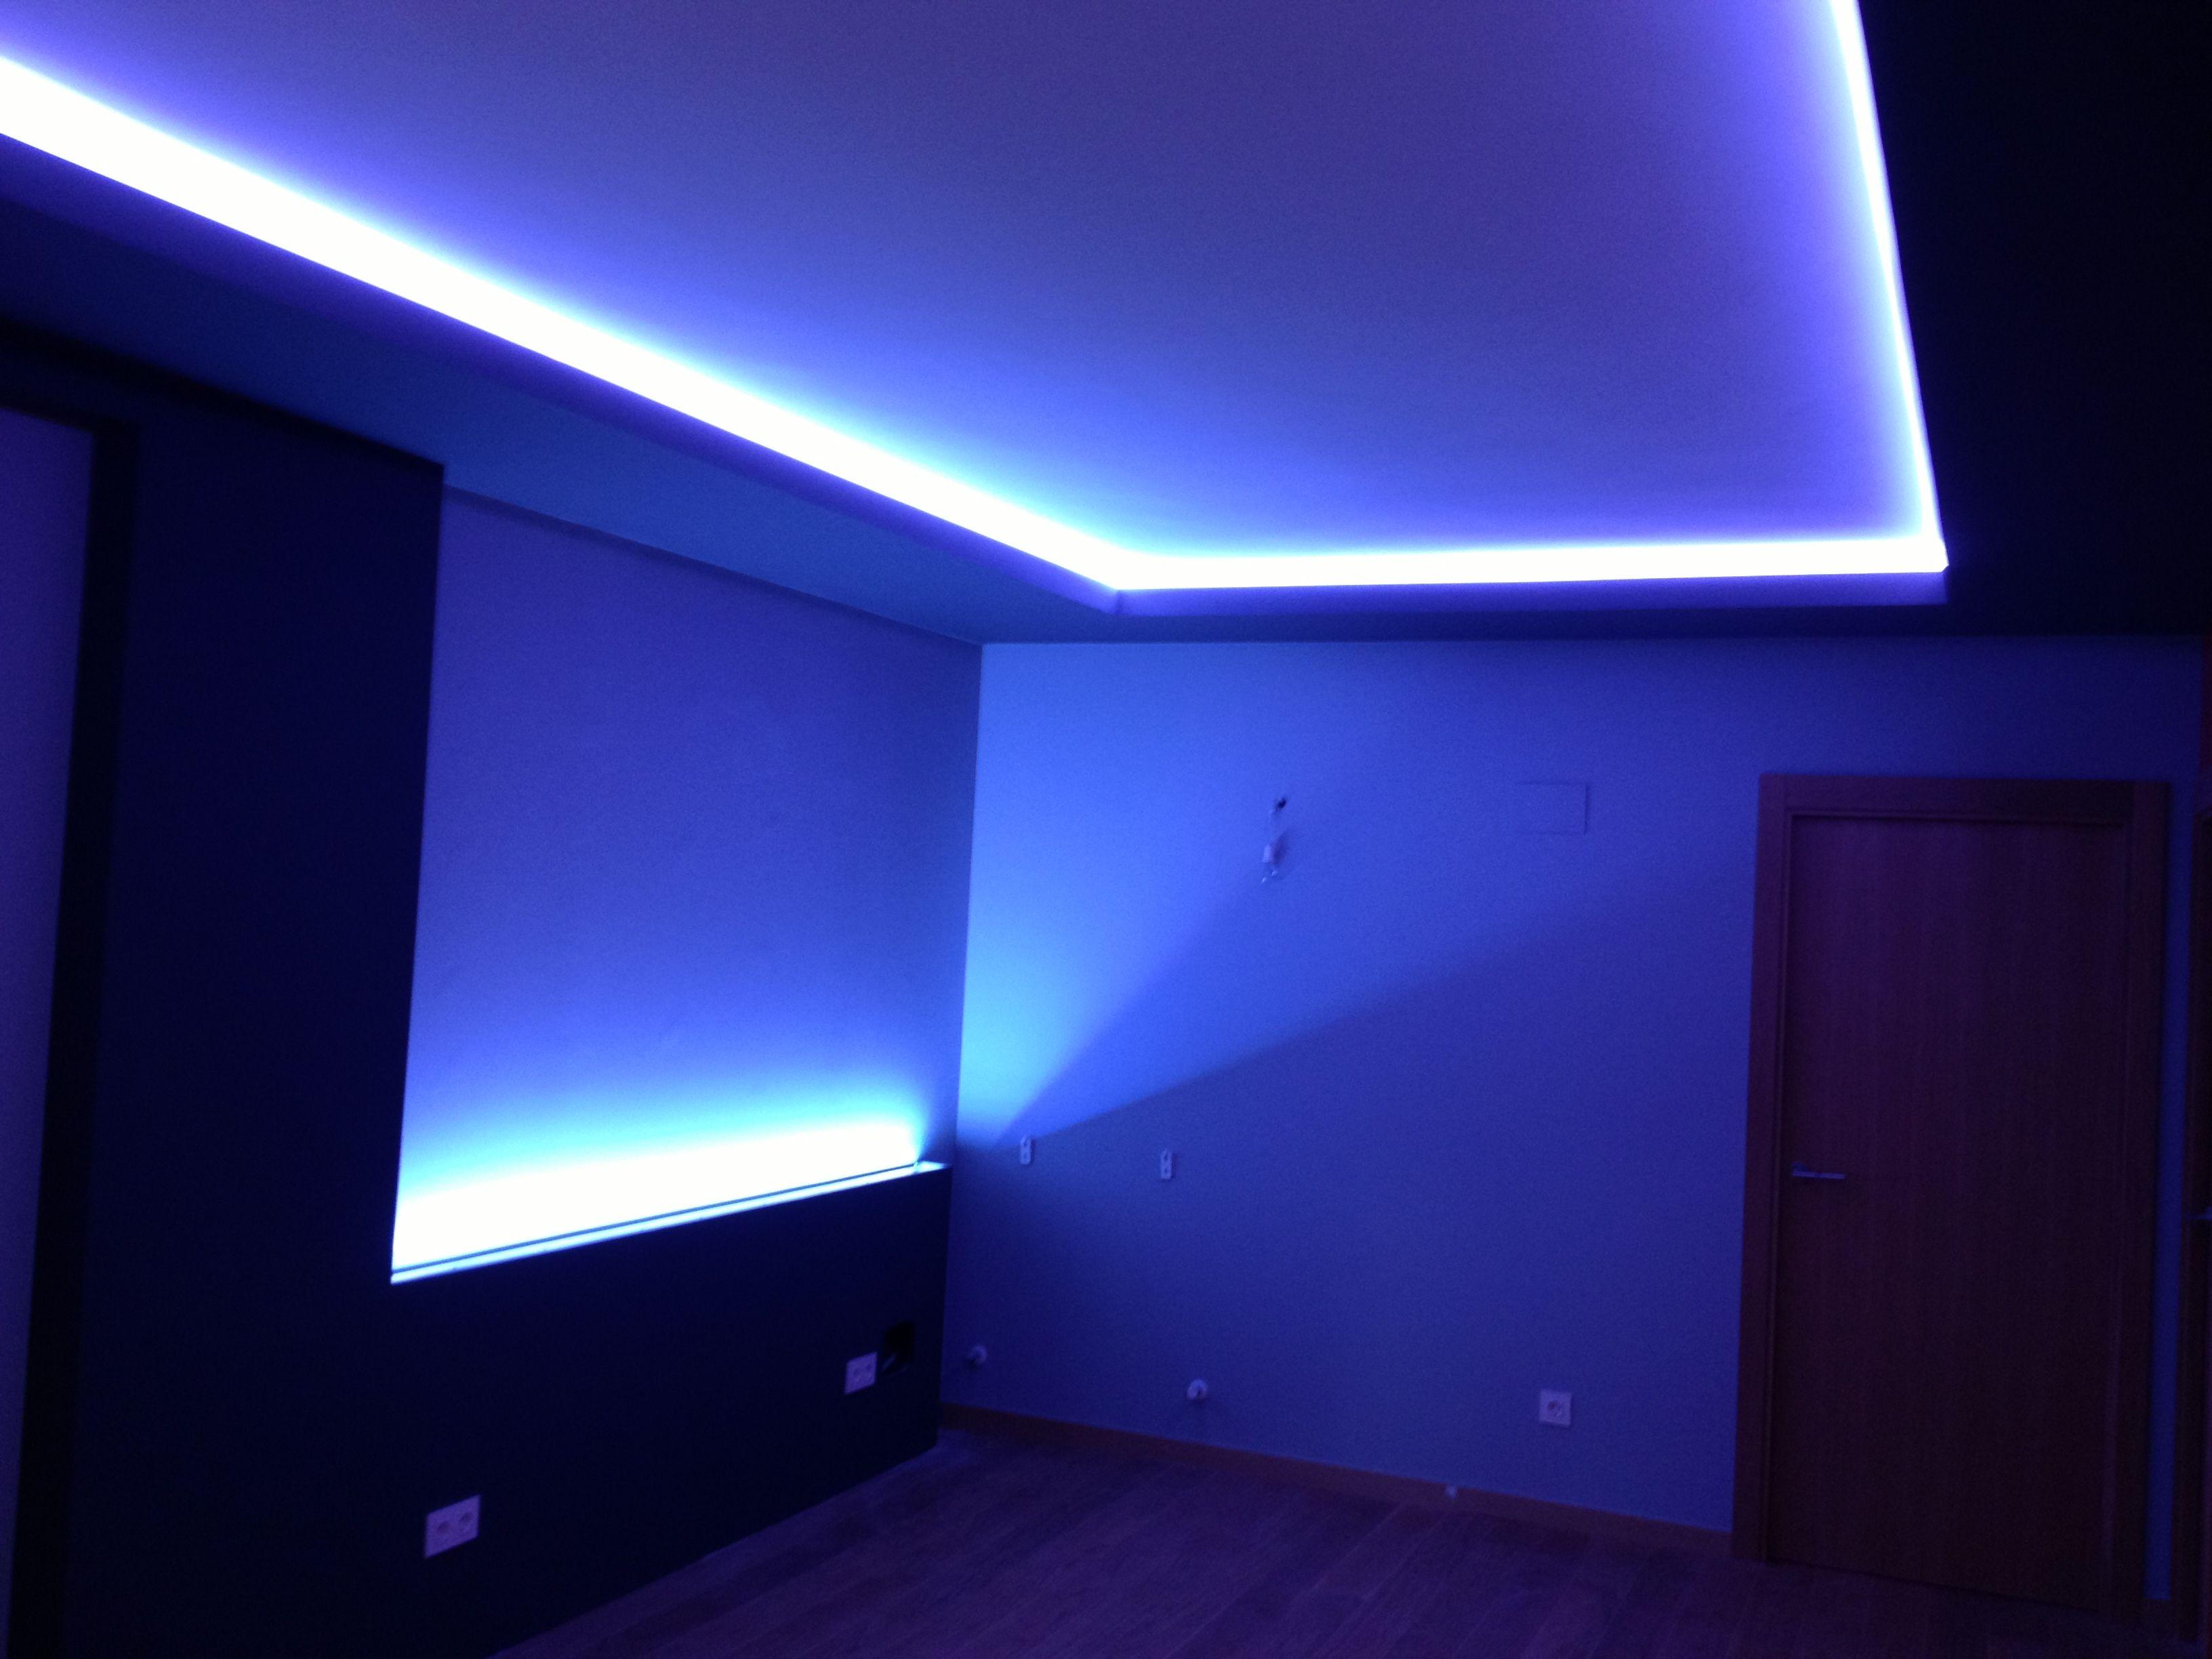 Iluminaci n tiras de led iluminacion led interiores - Iluminacion tiras led ...